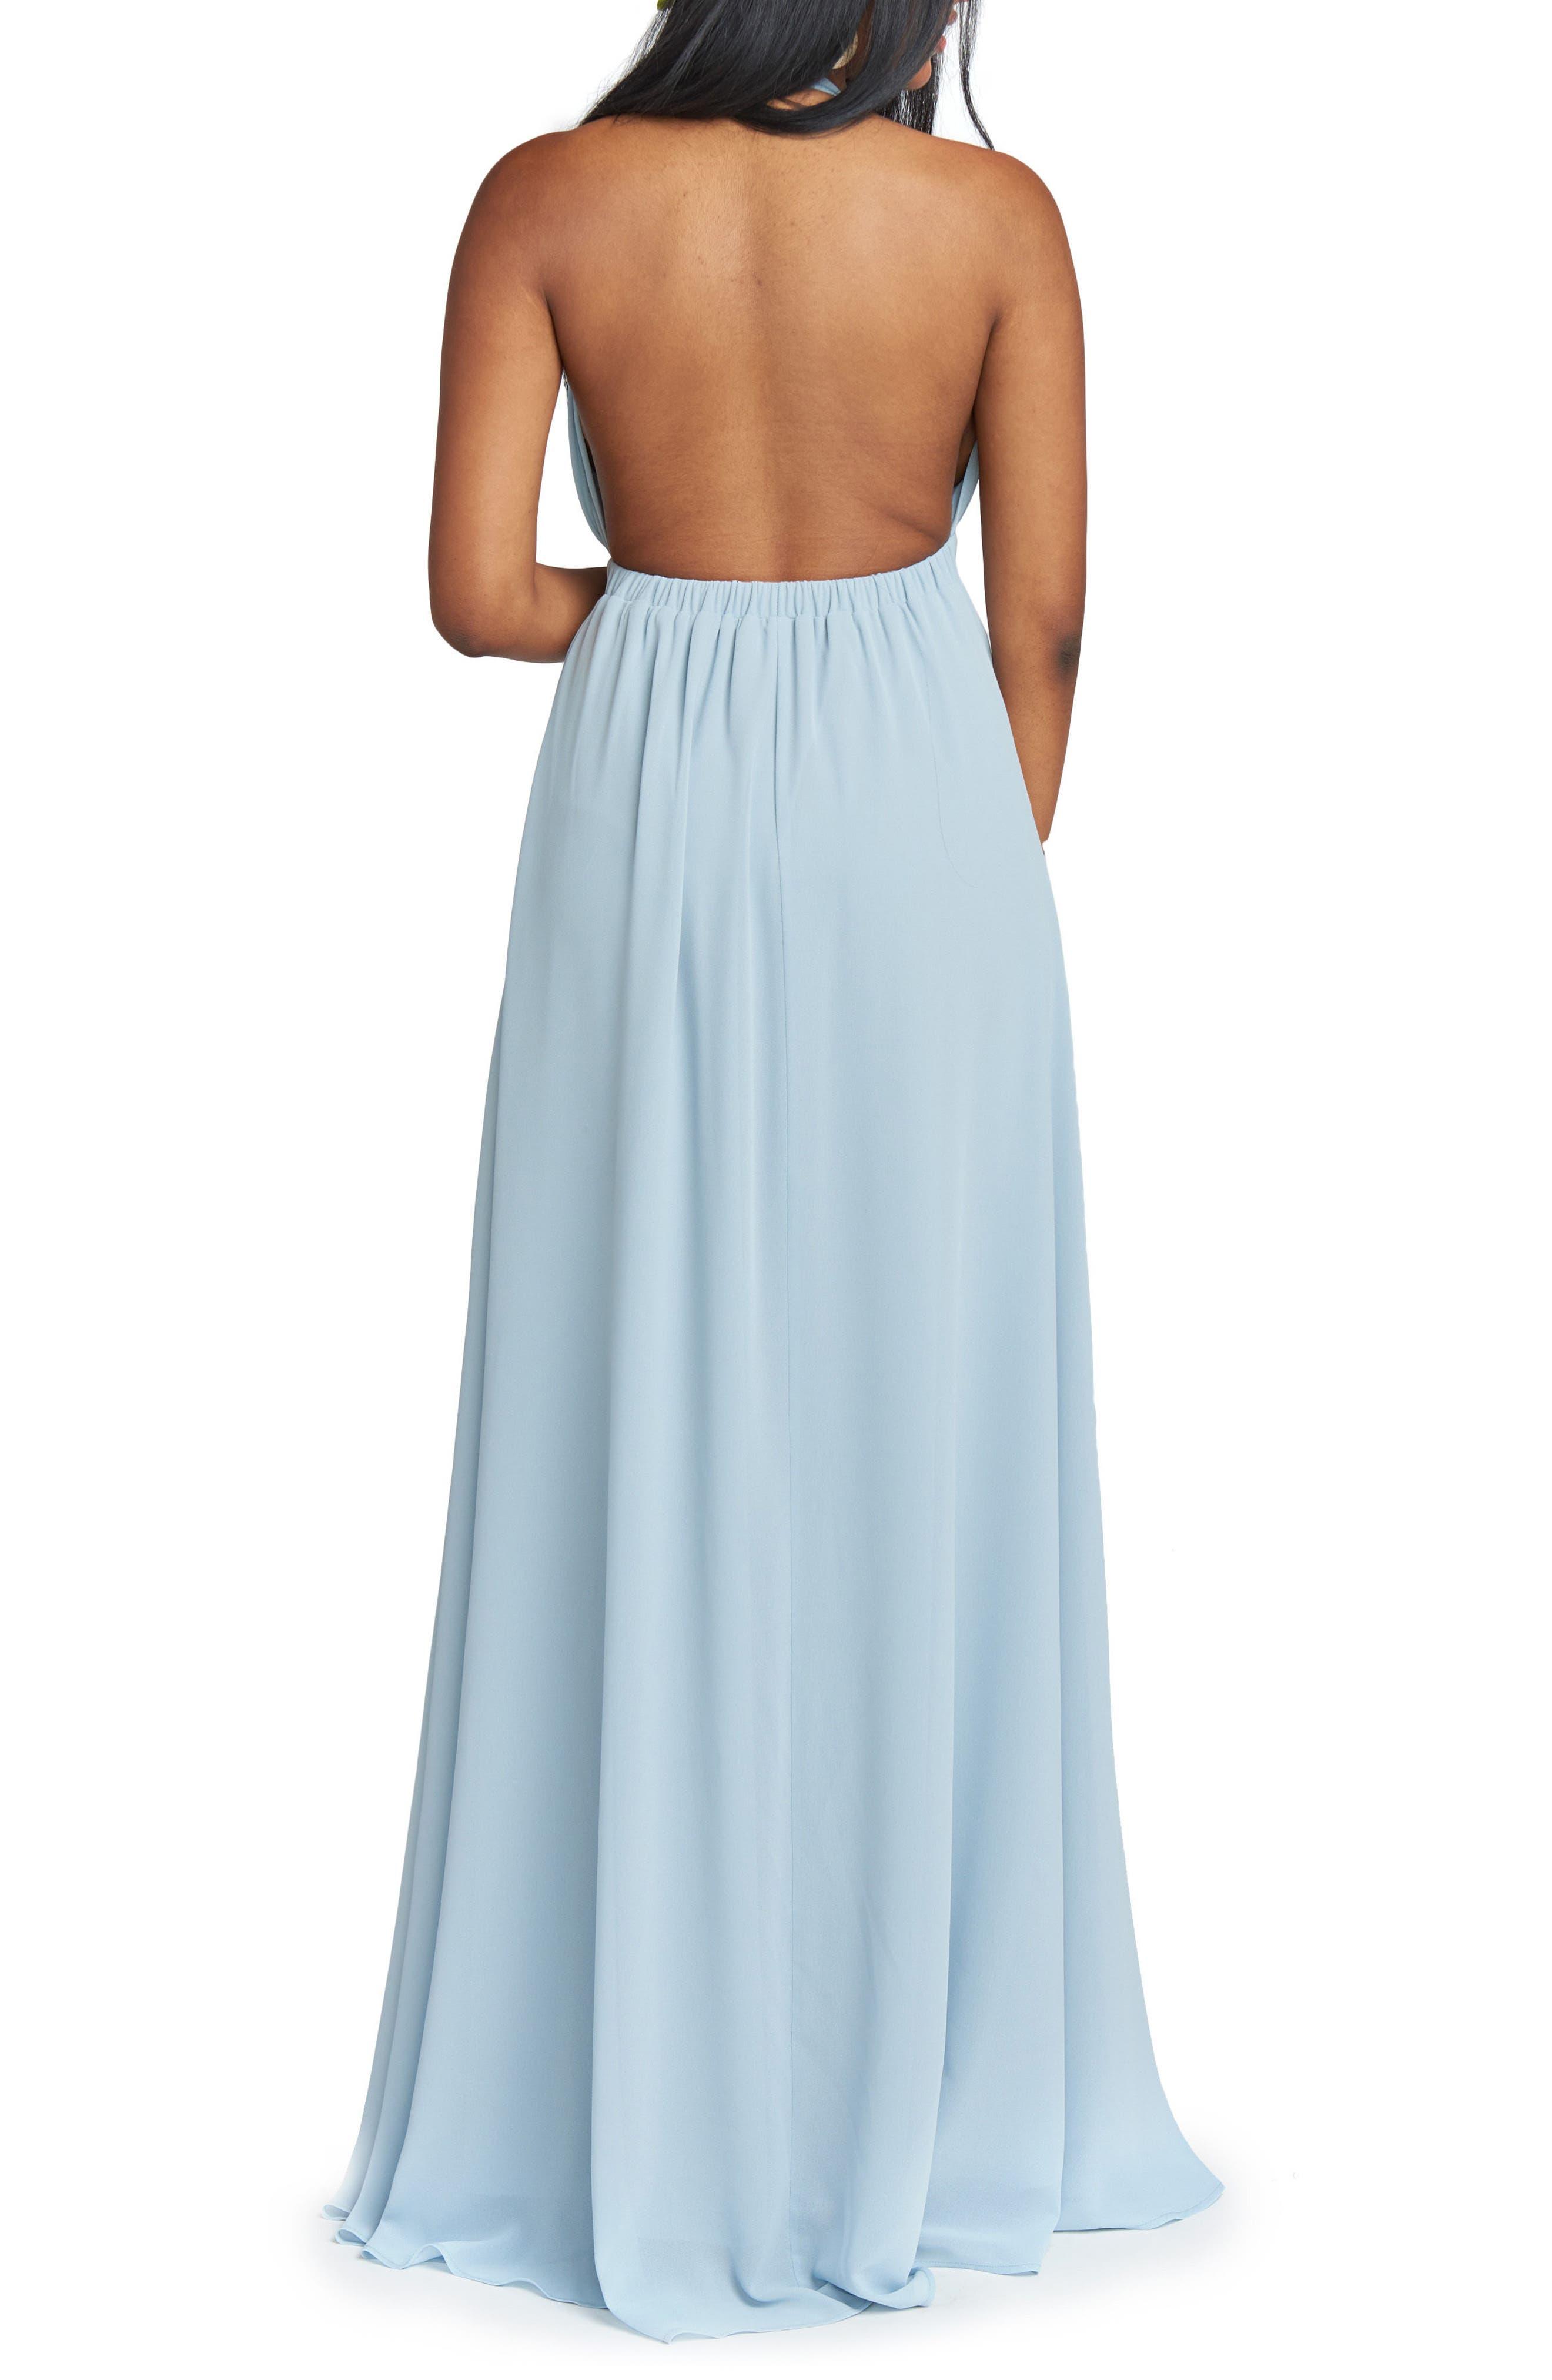 Luna Halter Gown,                             Alternate thumbnail 2, color,                             STEEL BLUE